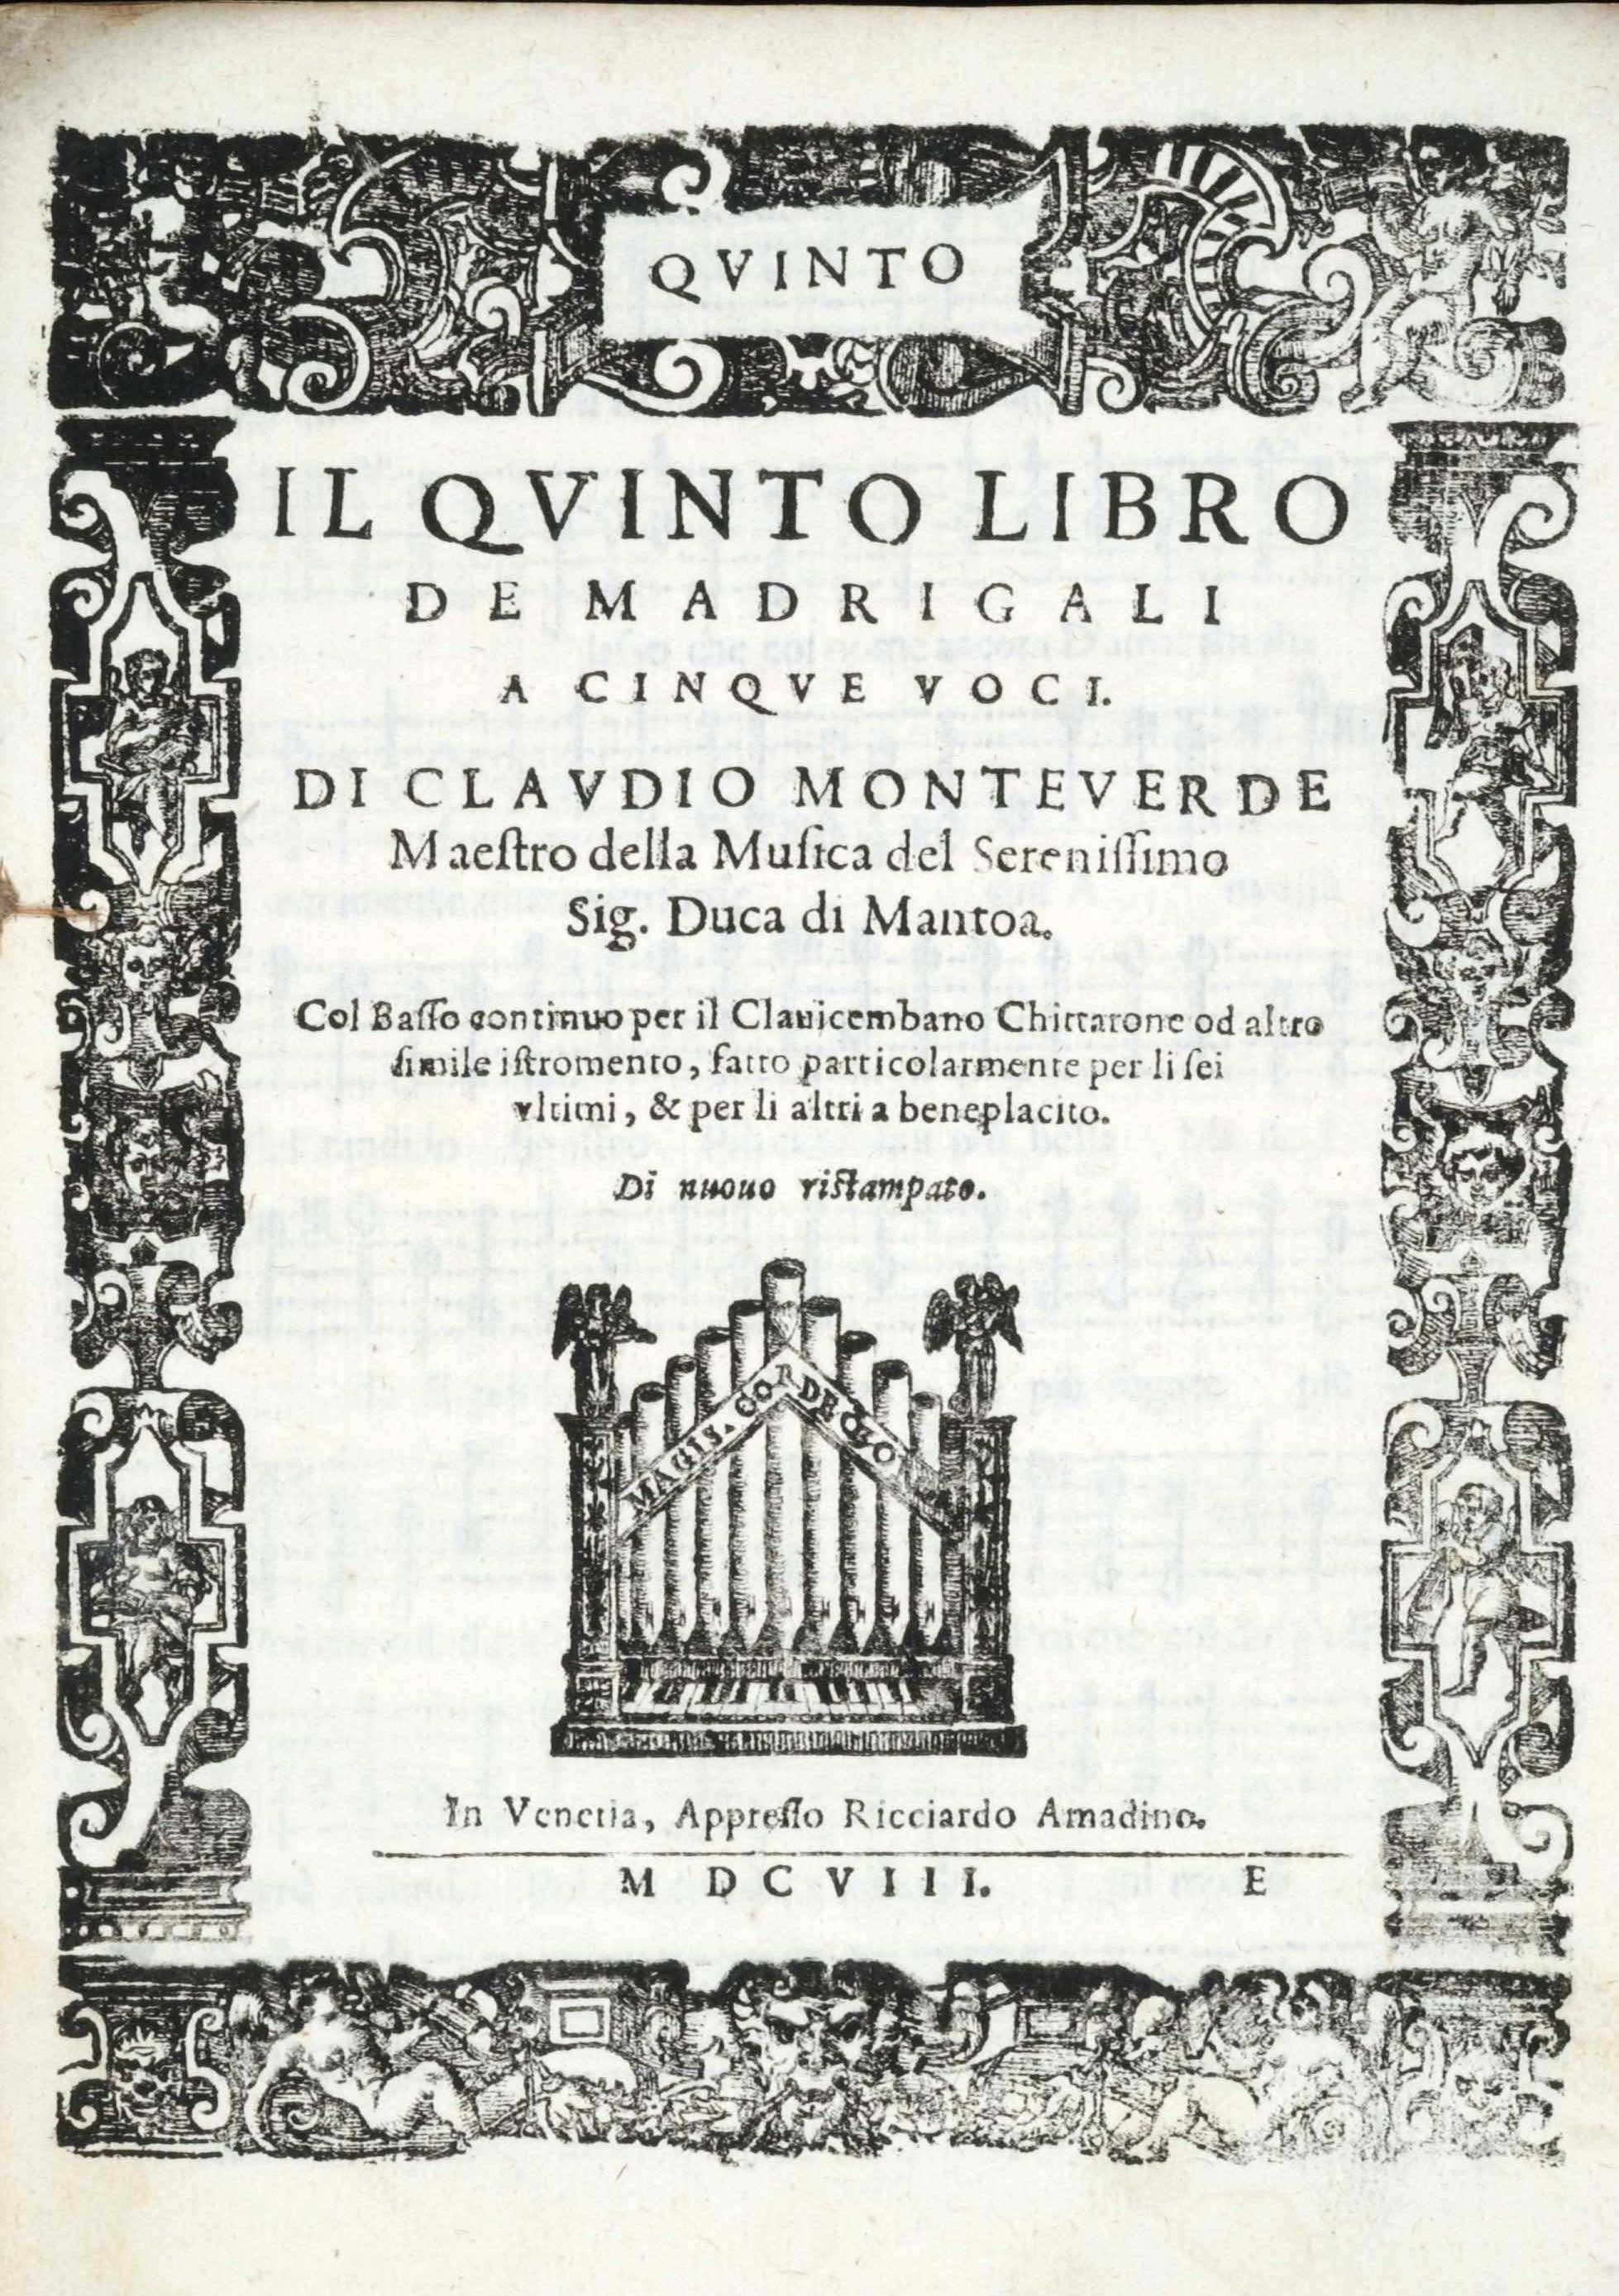 UniM Bail Music RB  LHD 093 <br> Claudio Monteverdi, composer ;  <br> Il quinto libro de madrigali a cinque voci  <br> Venice , 1608 <br> Hanson-Dyer Collection